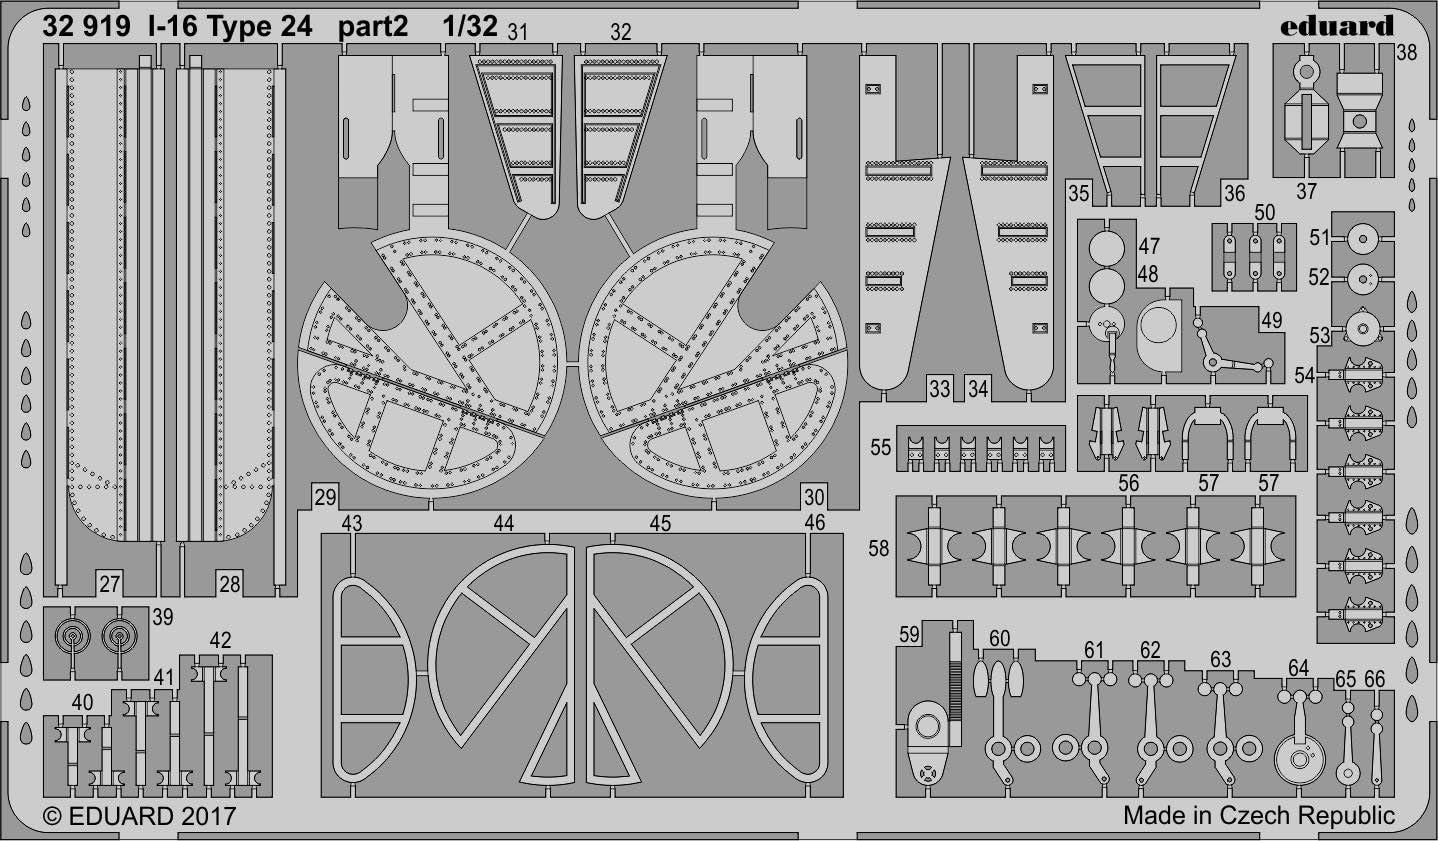 Photo-Etched Accessories Eduard EDBIG3386 Big Ed Set 1:32-Polikarpov I-16 Type 24 ICM Various